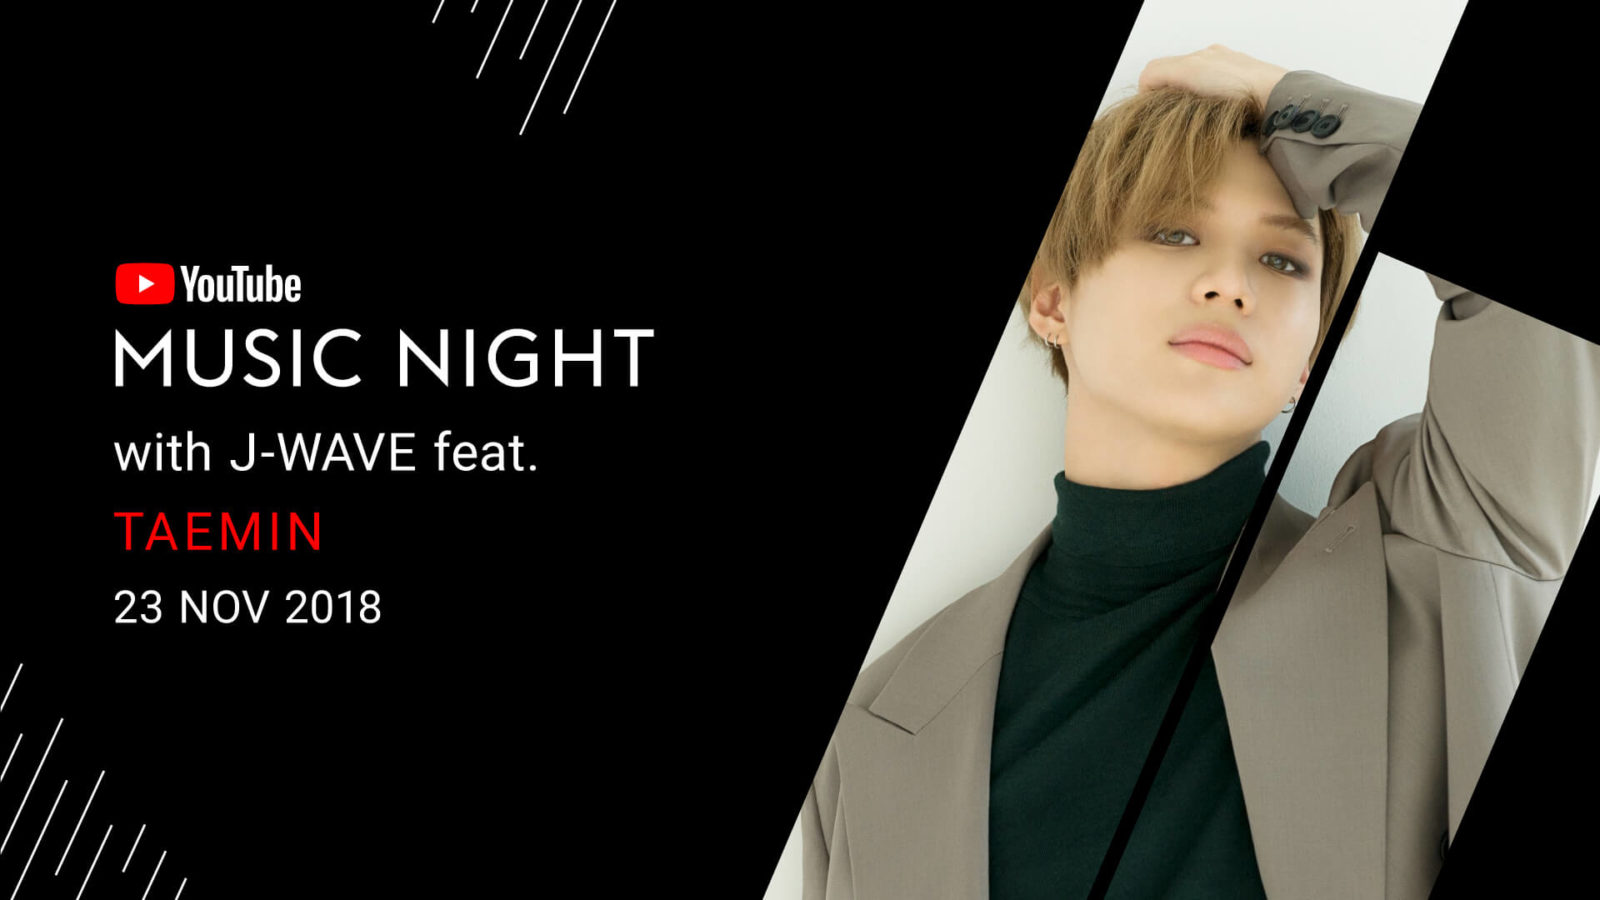 SHINeeテミン『YouTube Music Night with J-WAVE』に初出演決定サムネイル画像